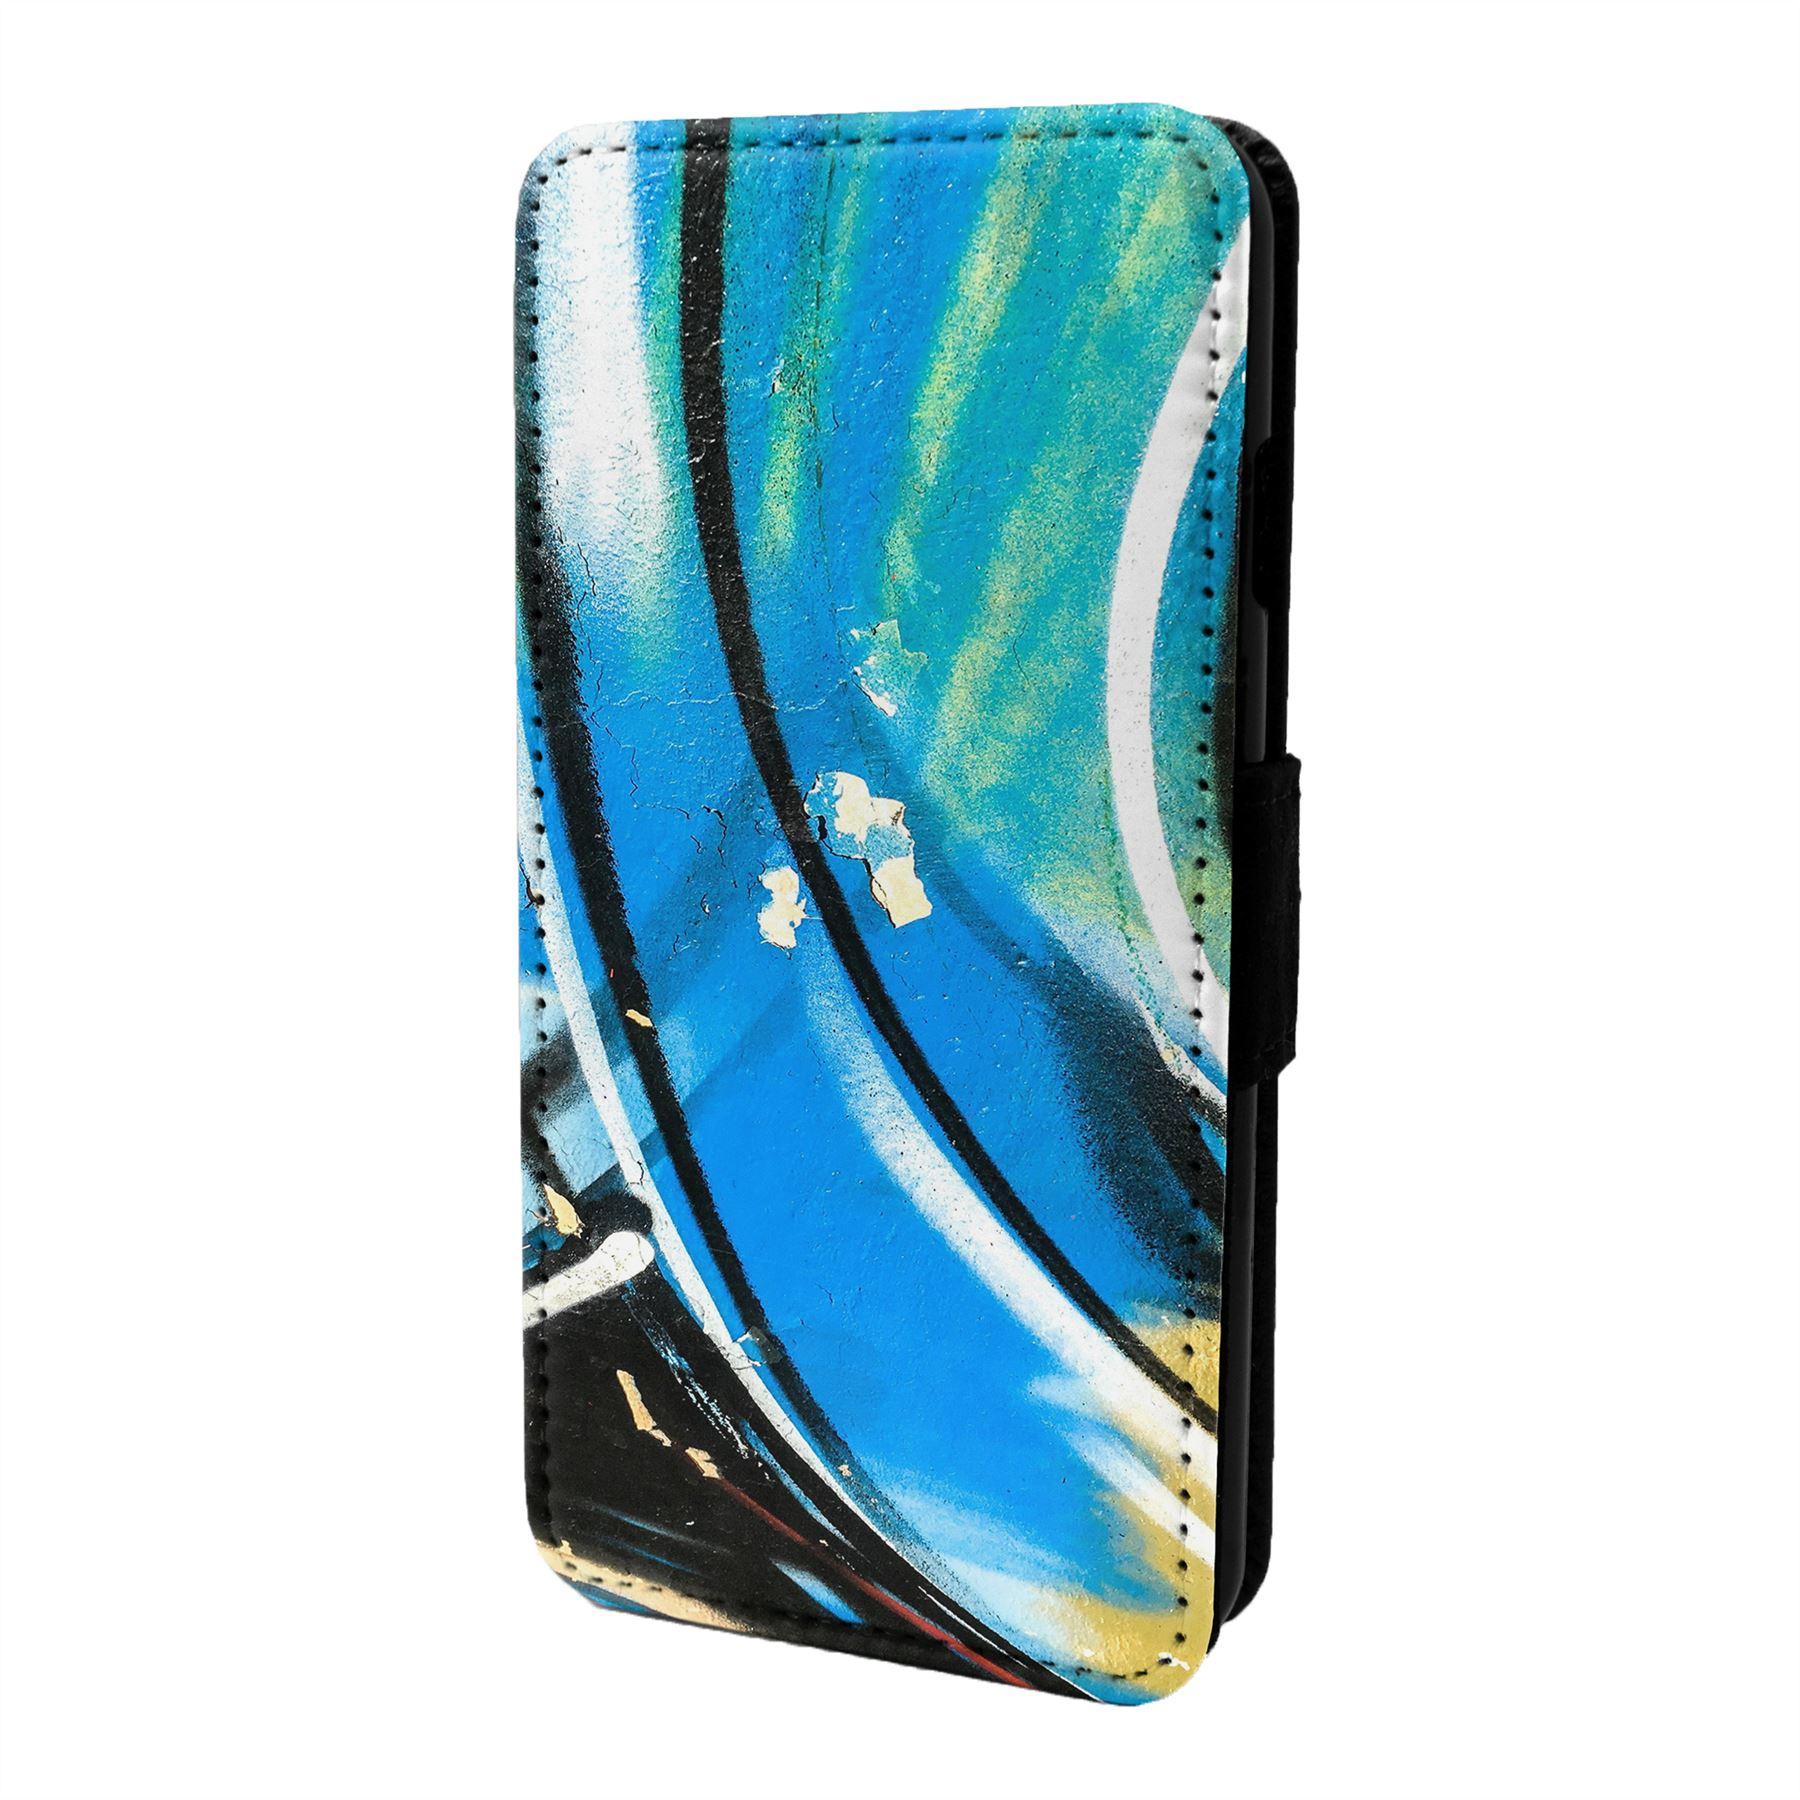 Graffiti-Art-Etui-Rabattable-pour-Telephone-Portable-S6779